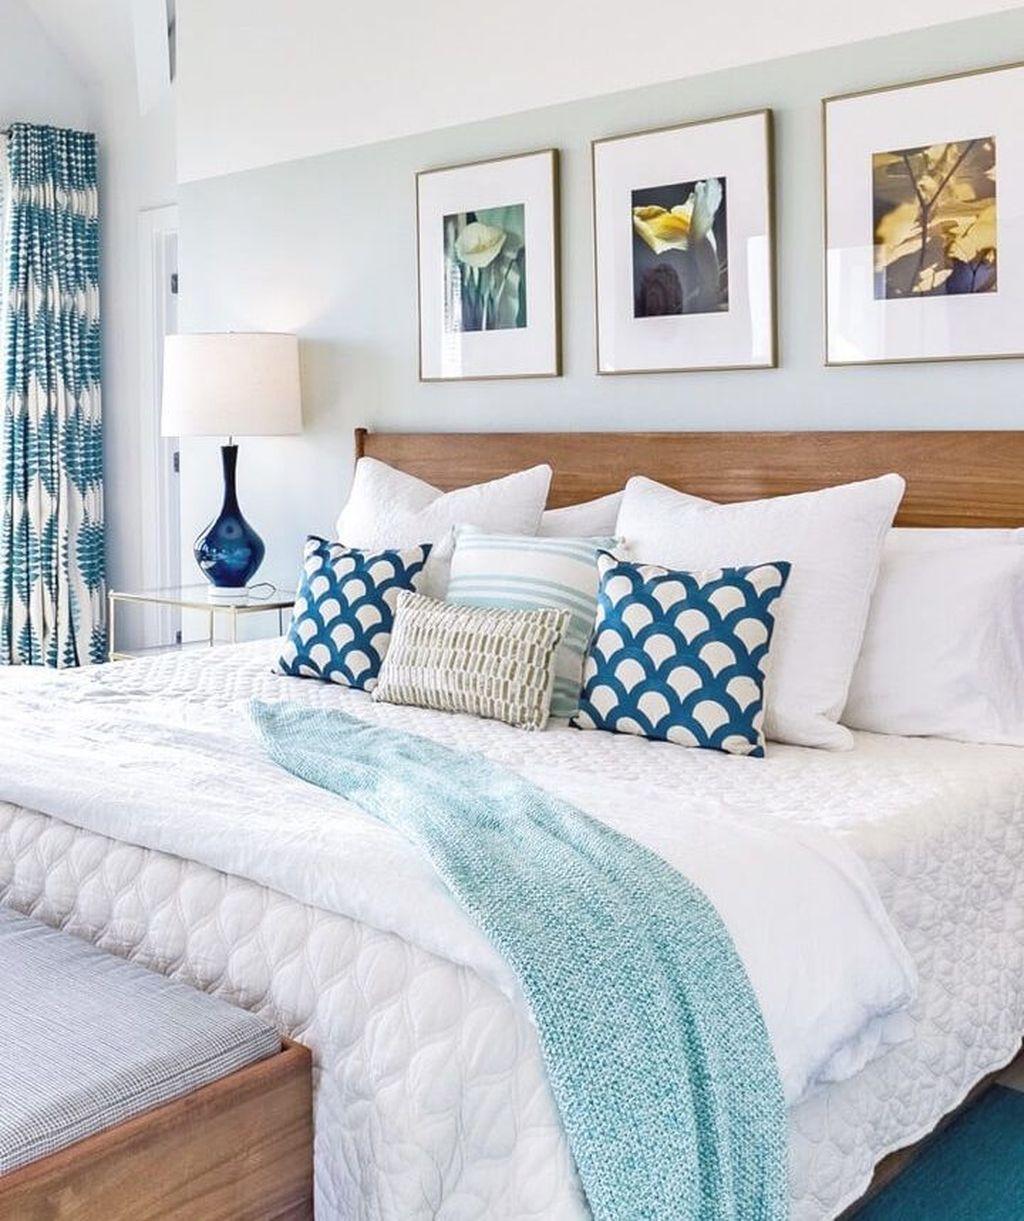 Admirable Beach House Decor Ideas You Should Copy 18